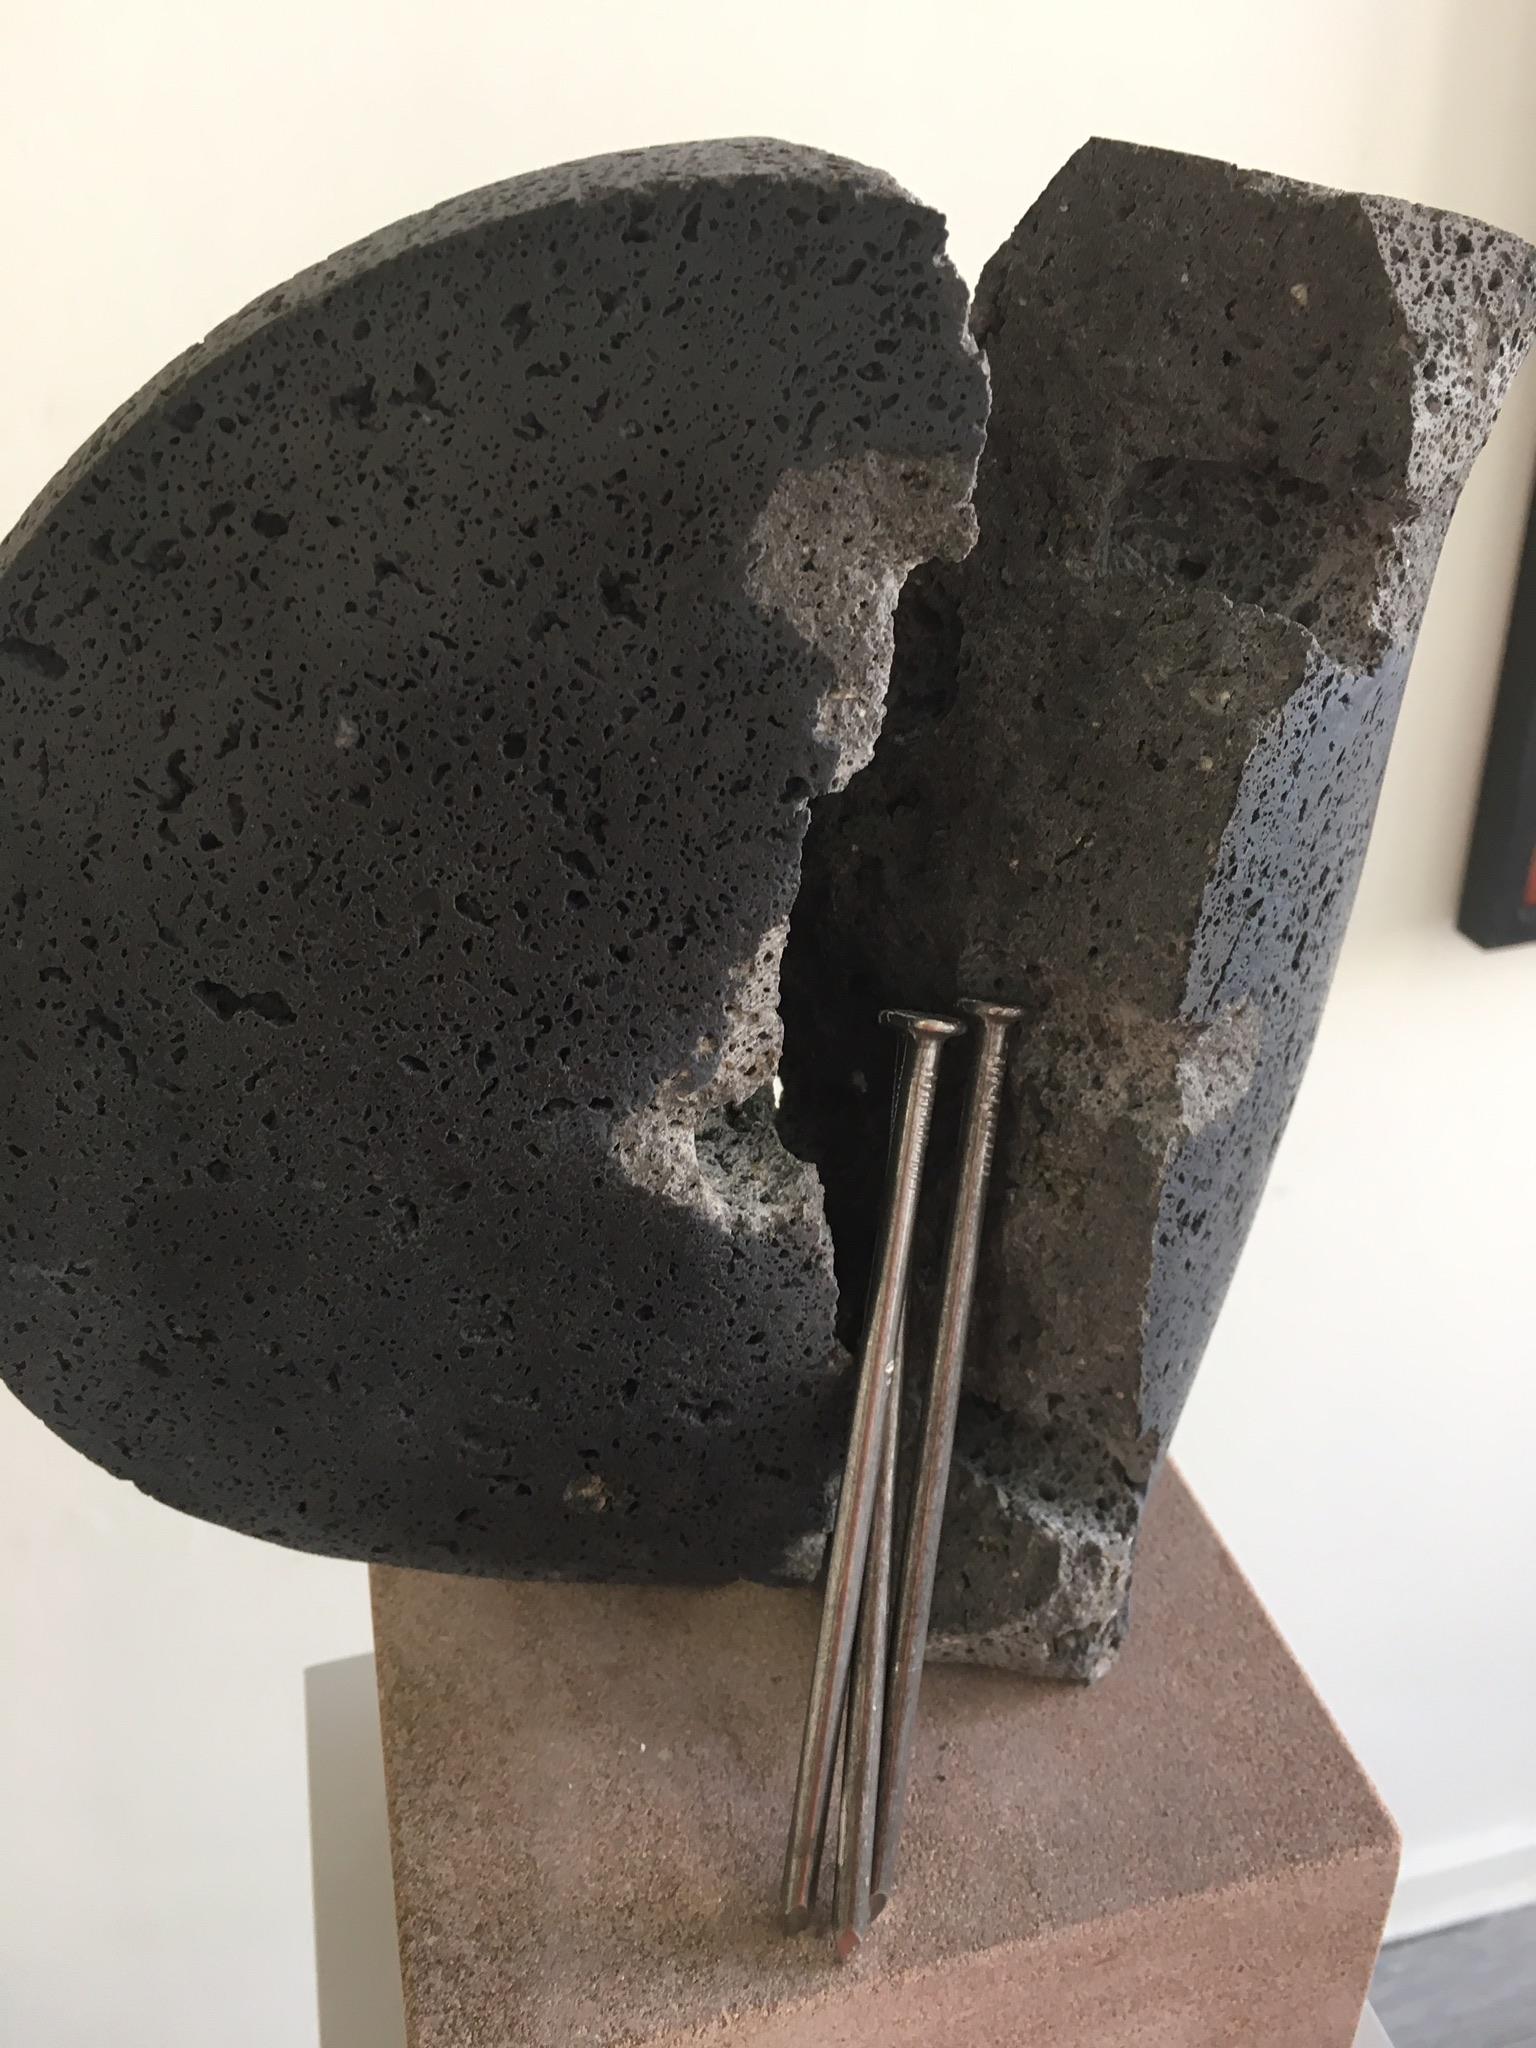 Fluchtpunkt V (02) | 2018 | Basaltlava - Stahl | 0,36 x 0,30 x 0,16 m |